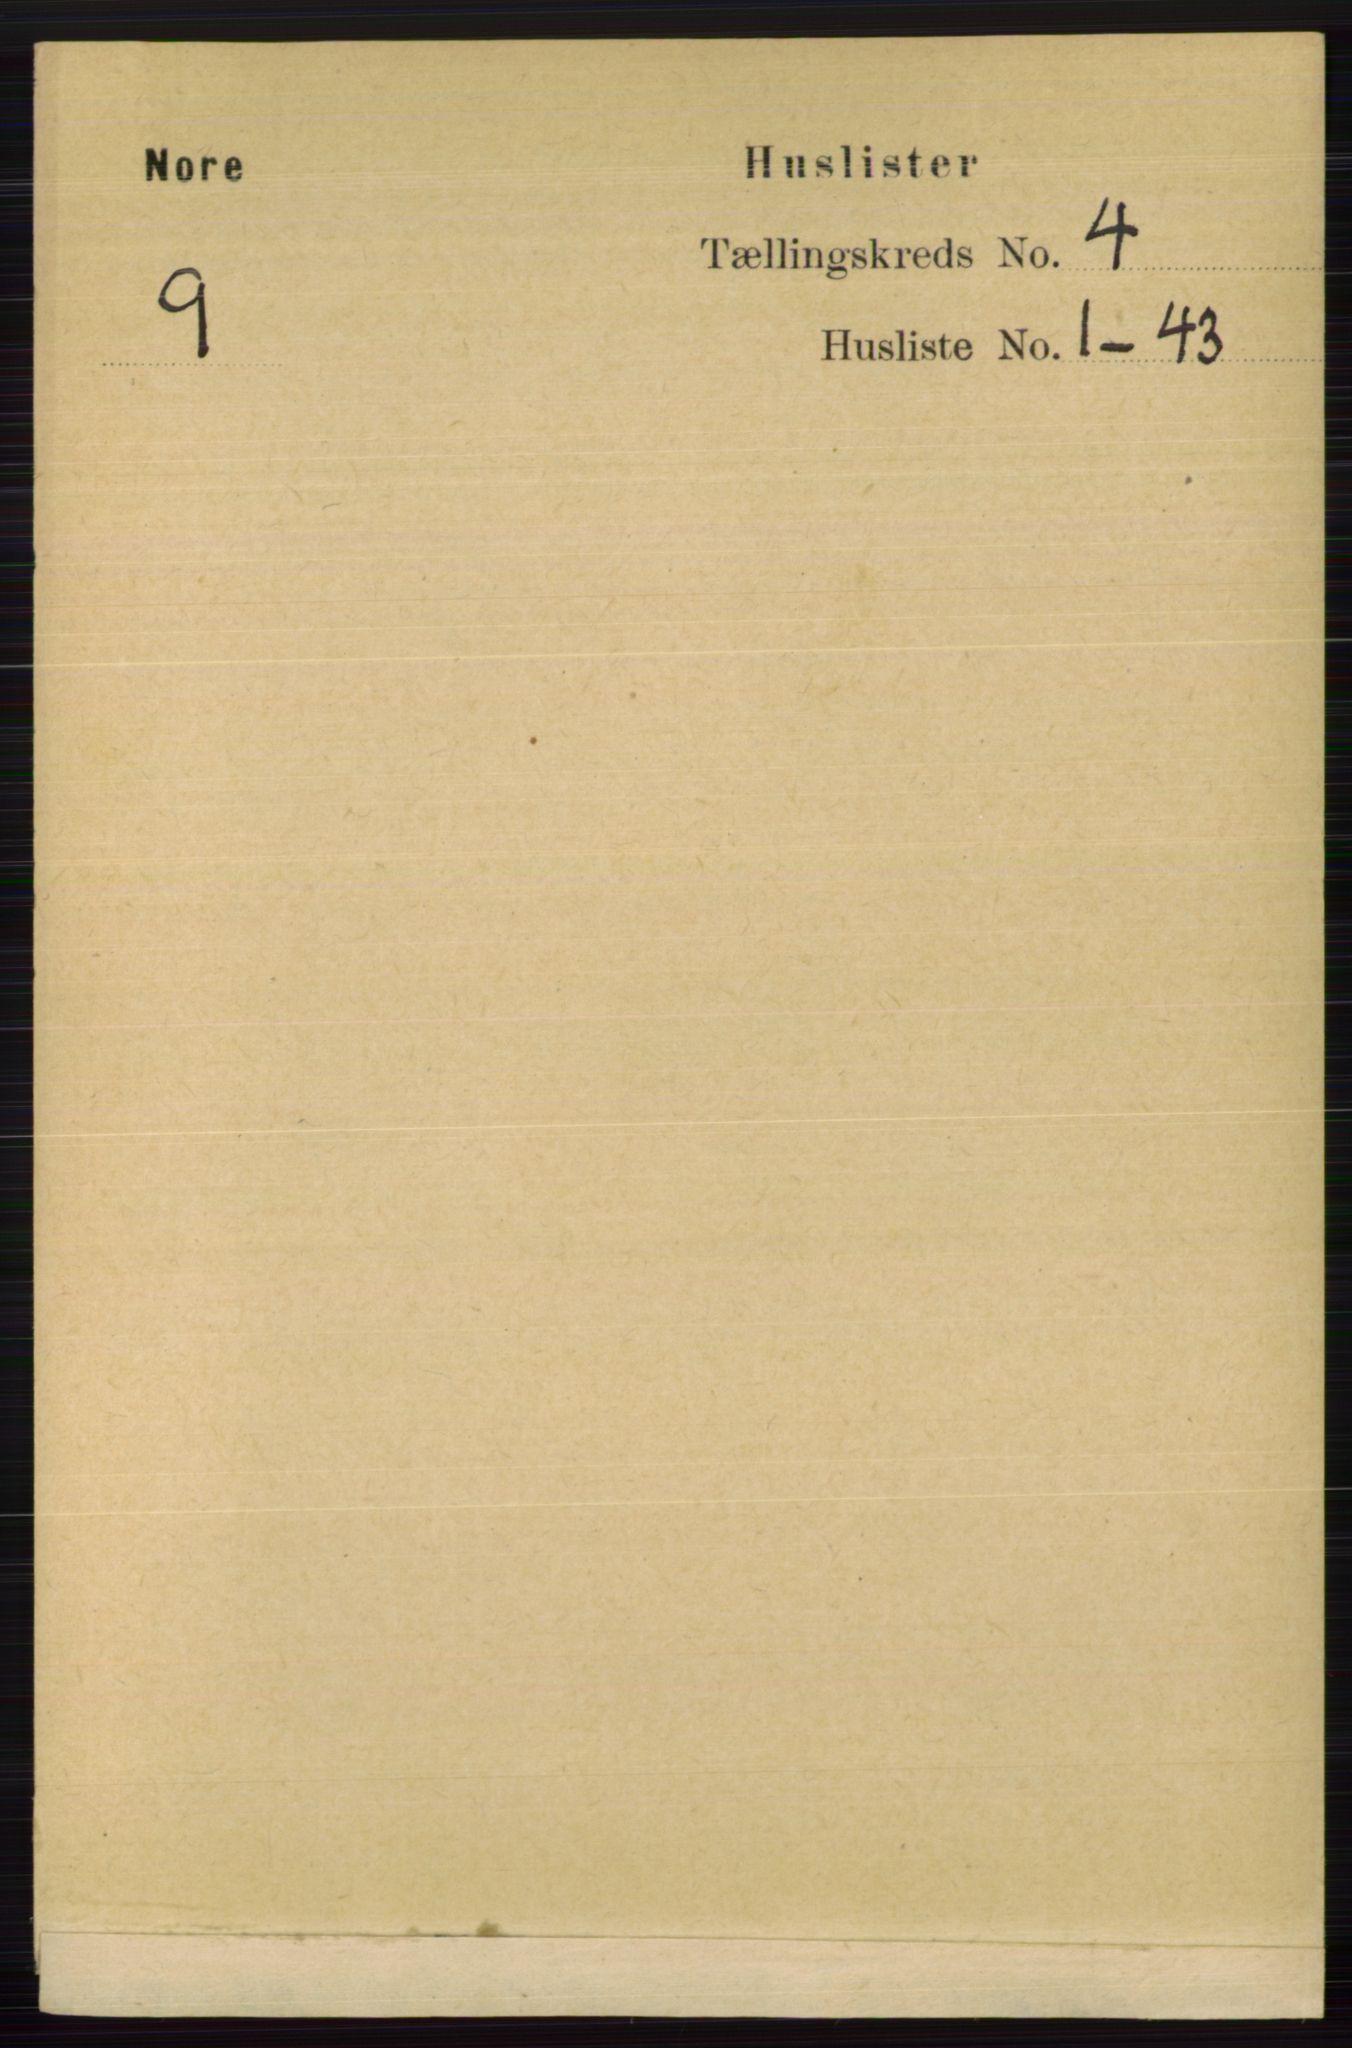 RA, Folketelling 1891 for 0633 Nore herred, 1891, s. 1218